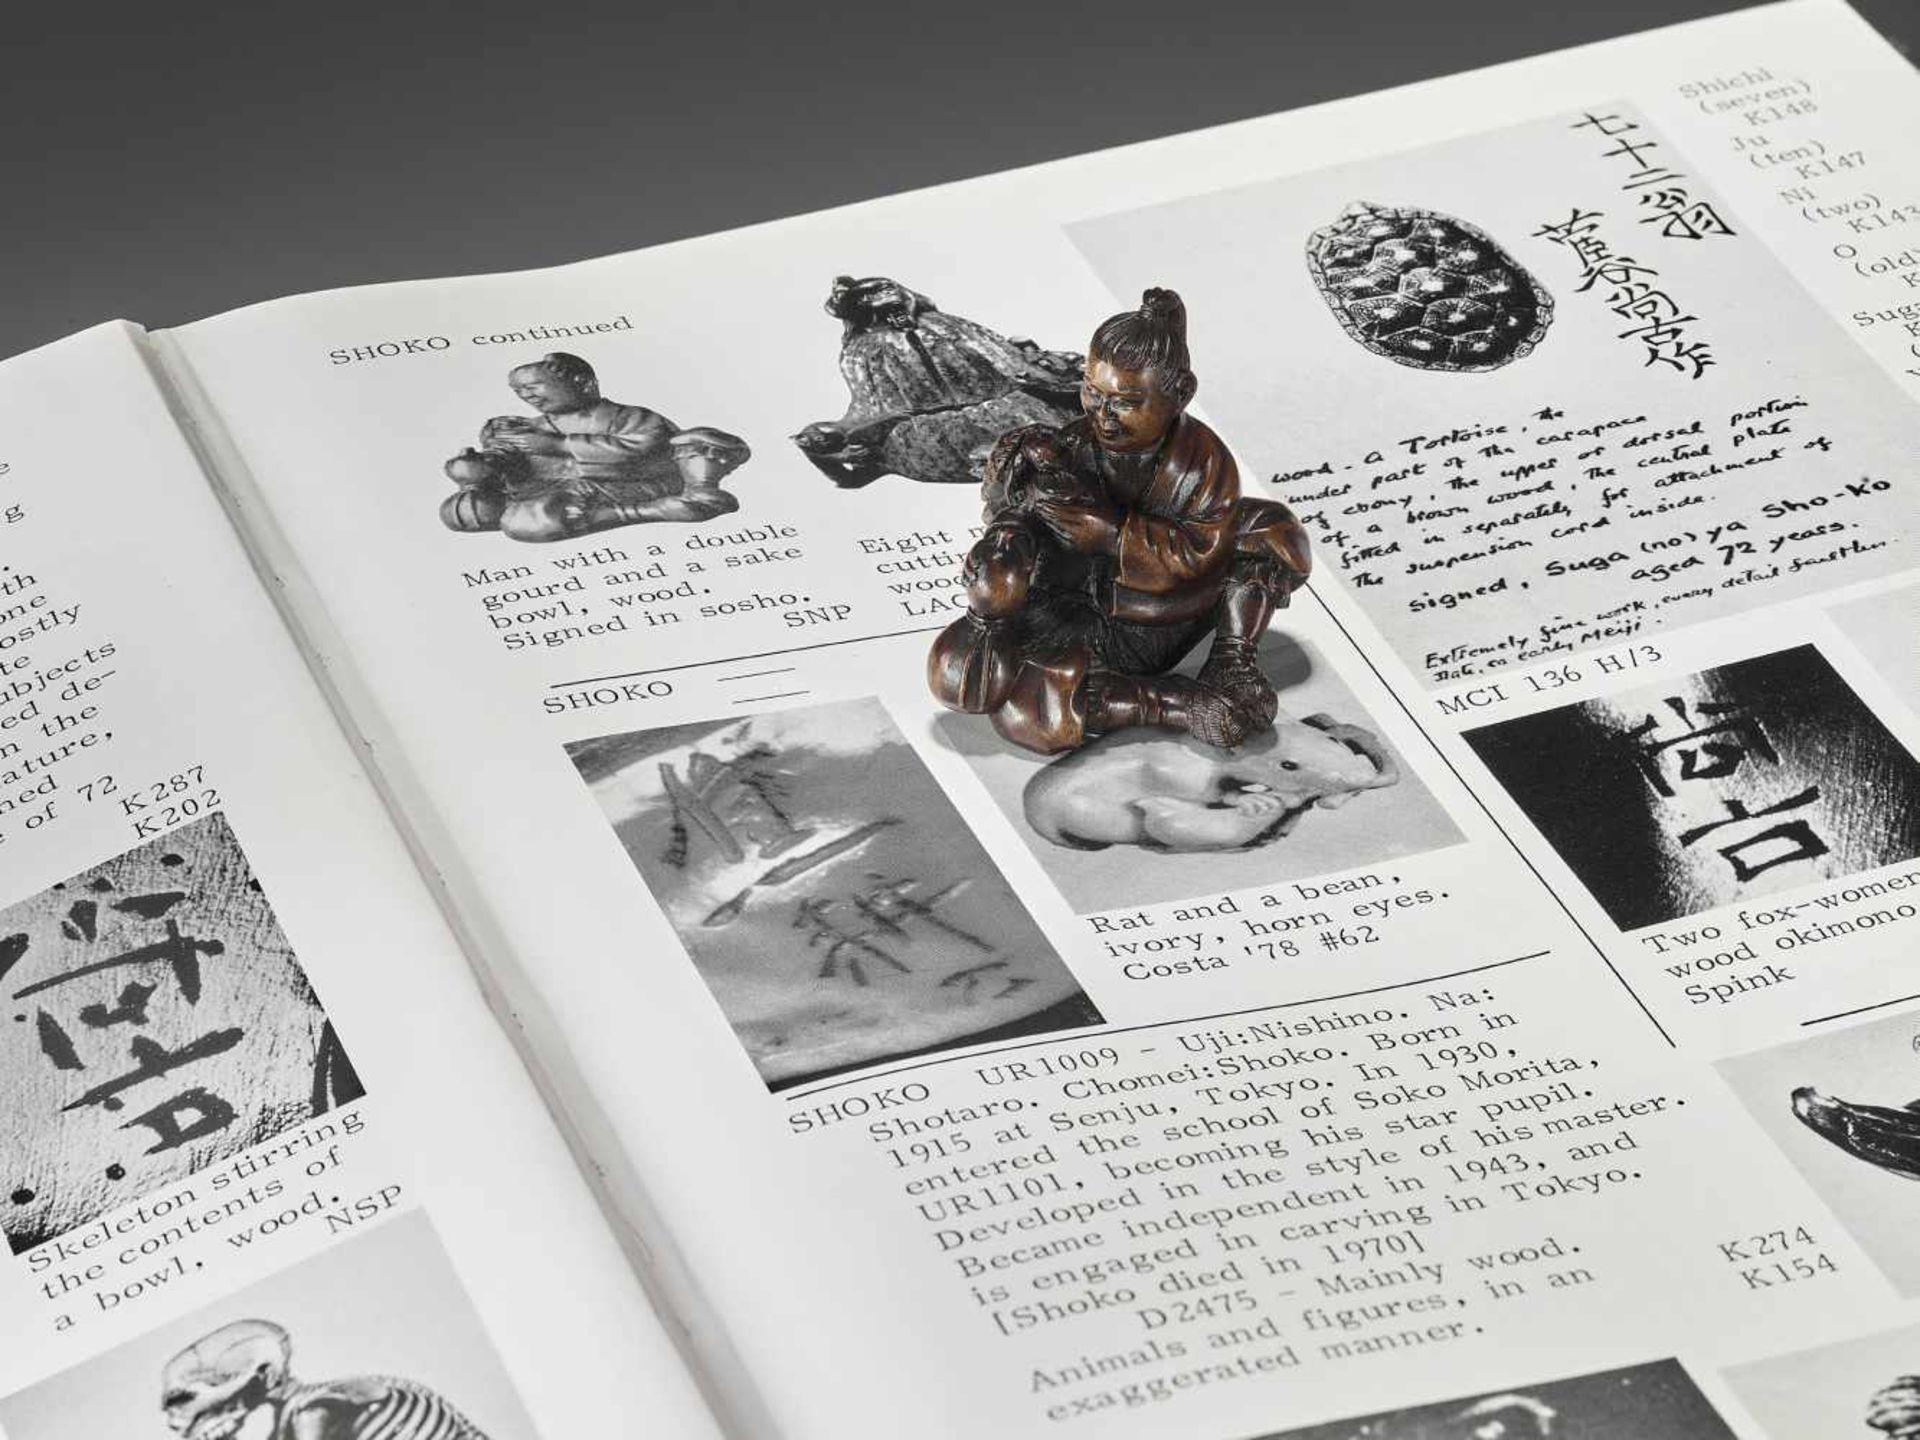 SHOKO: A RARE WOOD NETSUKE OF URASHIMA TARO WITH TURTLE By Shoko, signed ShokoJapan, Takayama, - Image 2 of 12